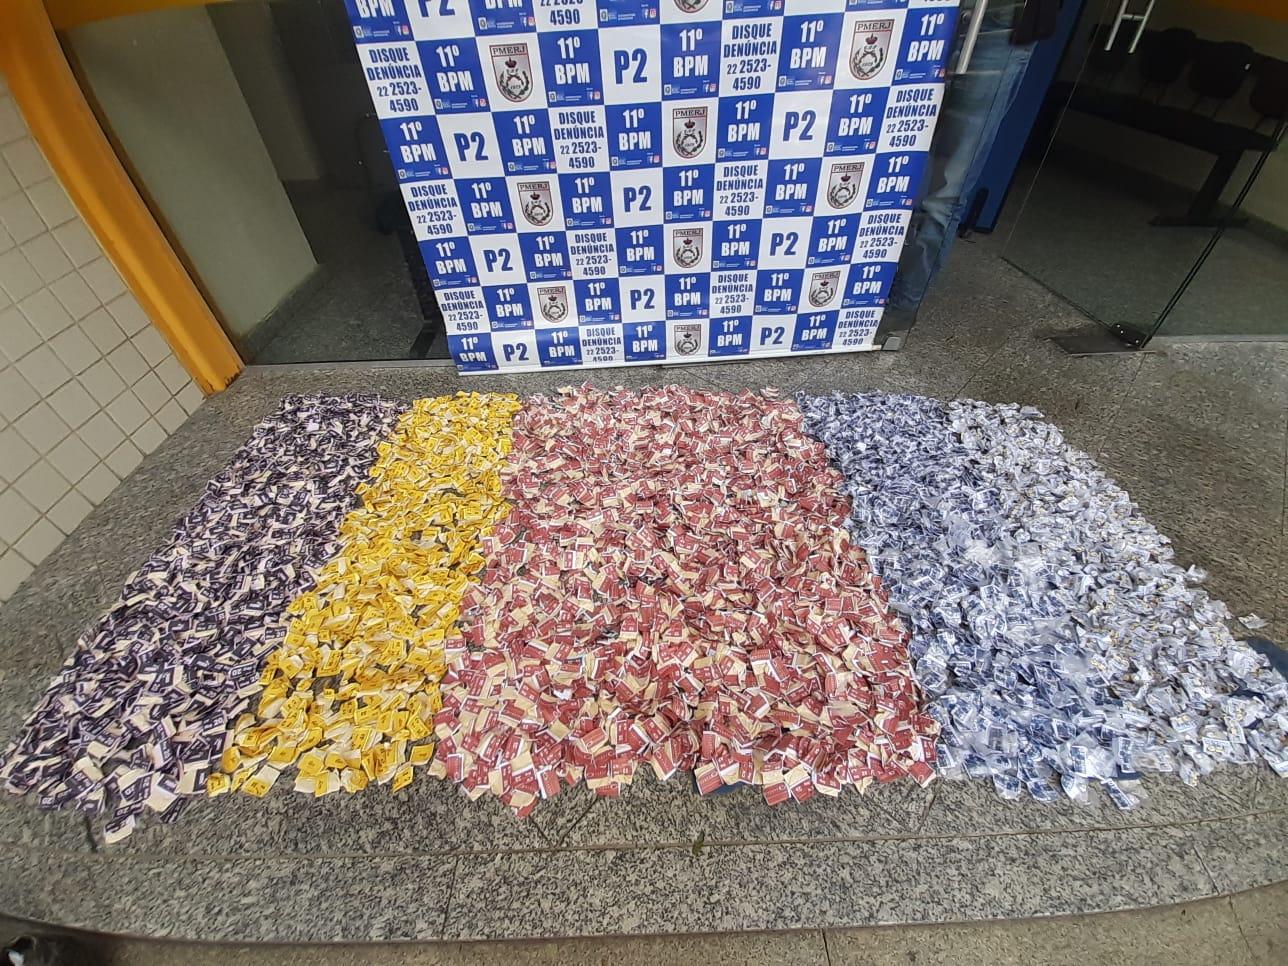 A droga apreendida no Alto de Olaria (Foto: 11 BPM)